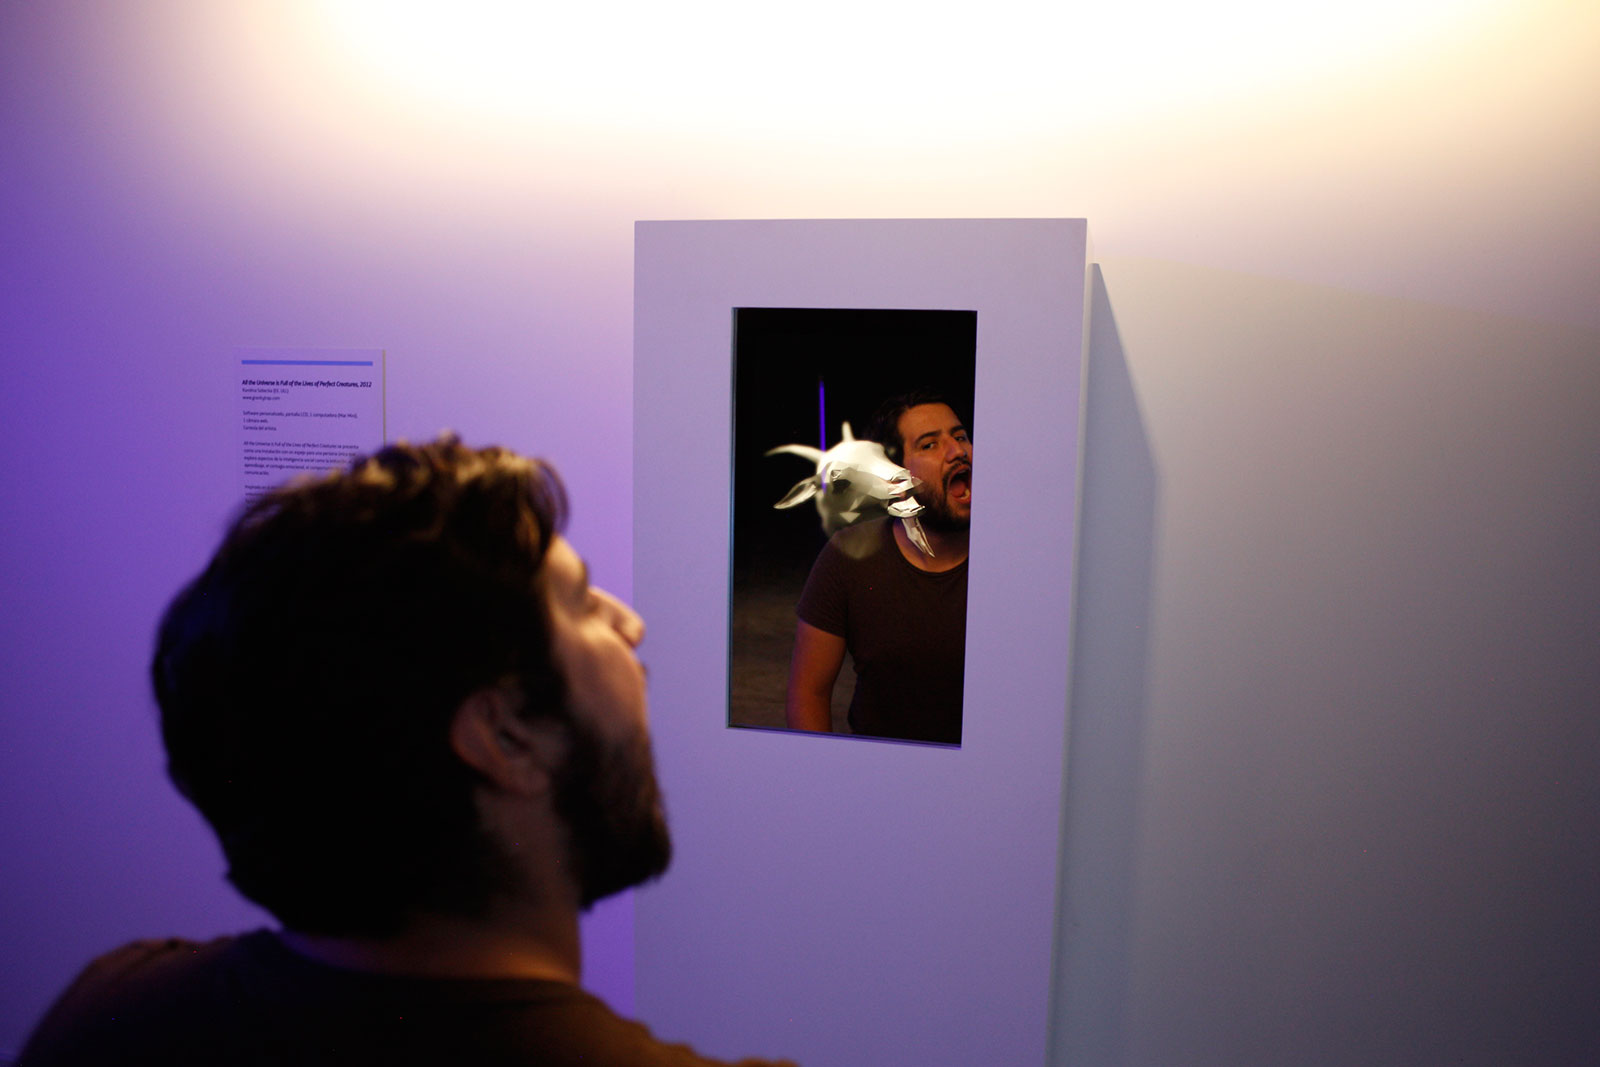 man imitating interactive video of animated goat